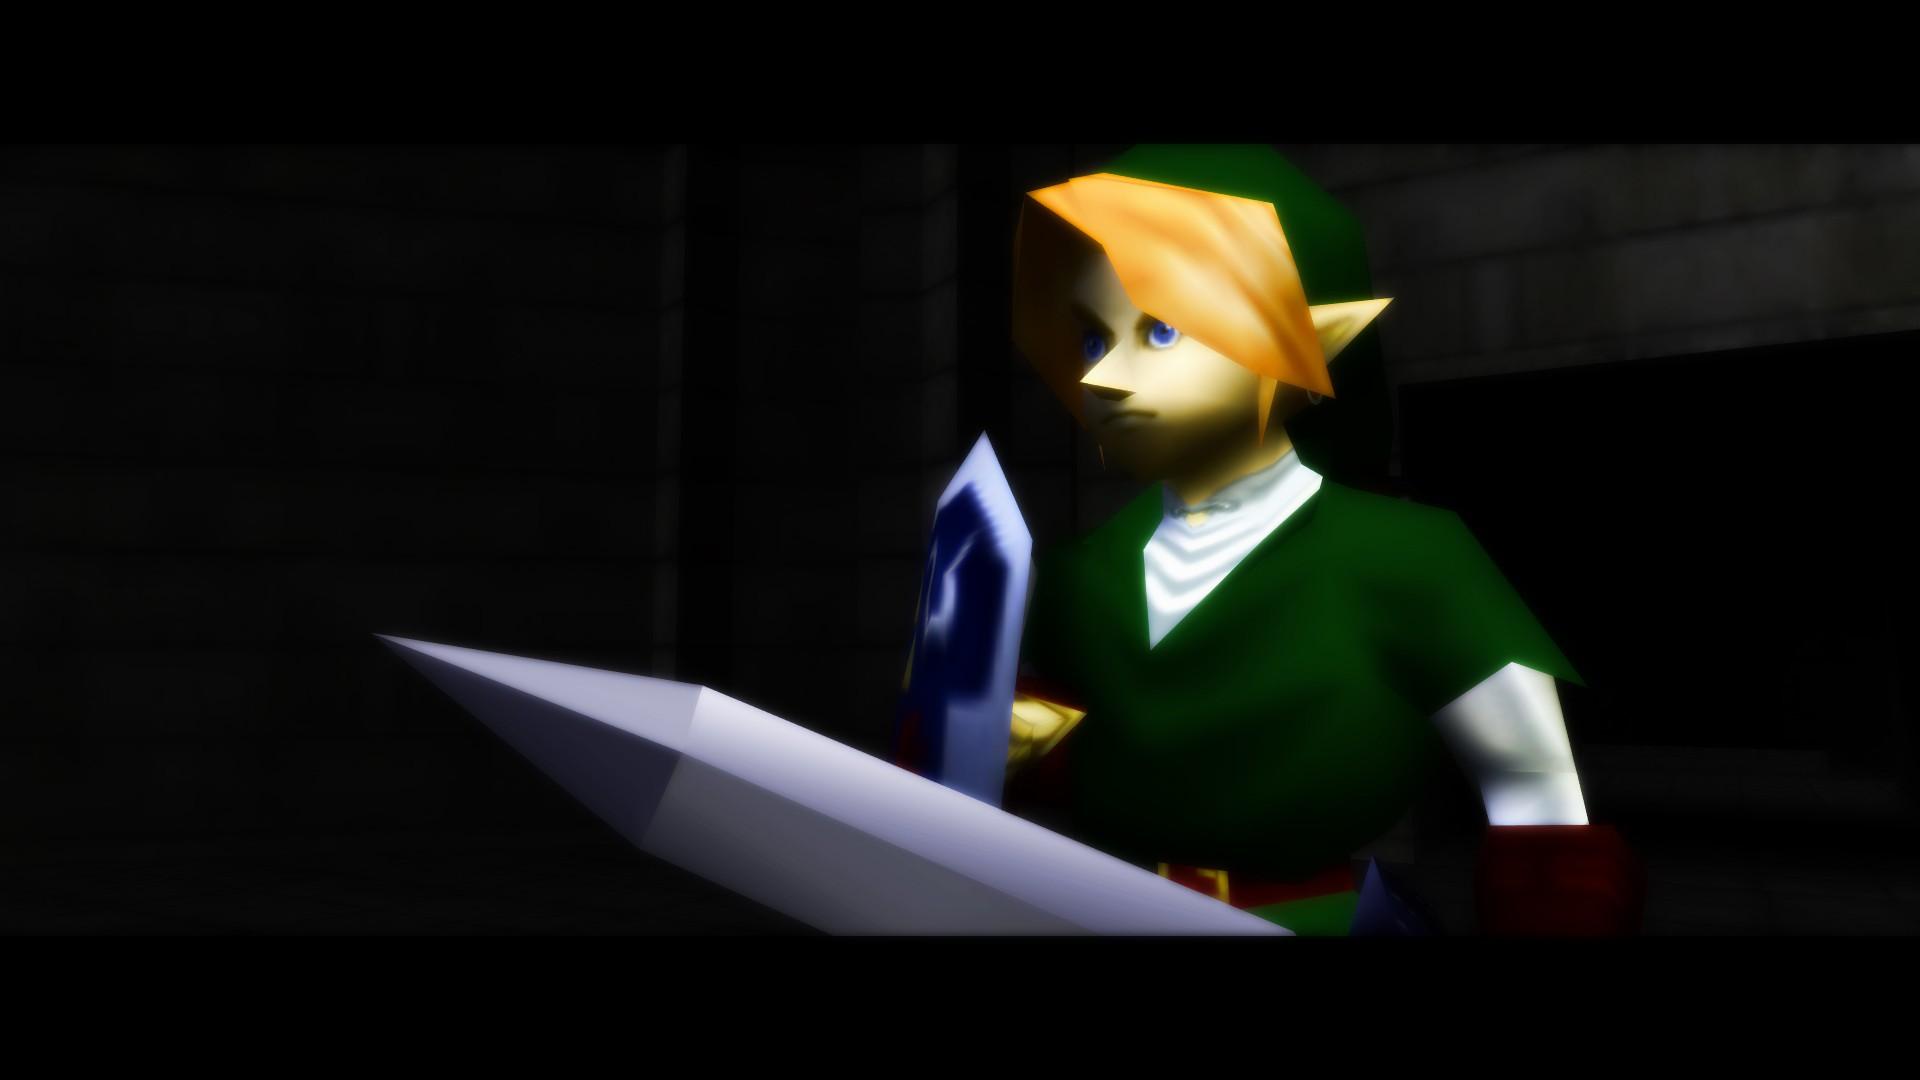 Wallpaper Video Games Anime The Legend Of Zelda The Legend Of